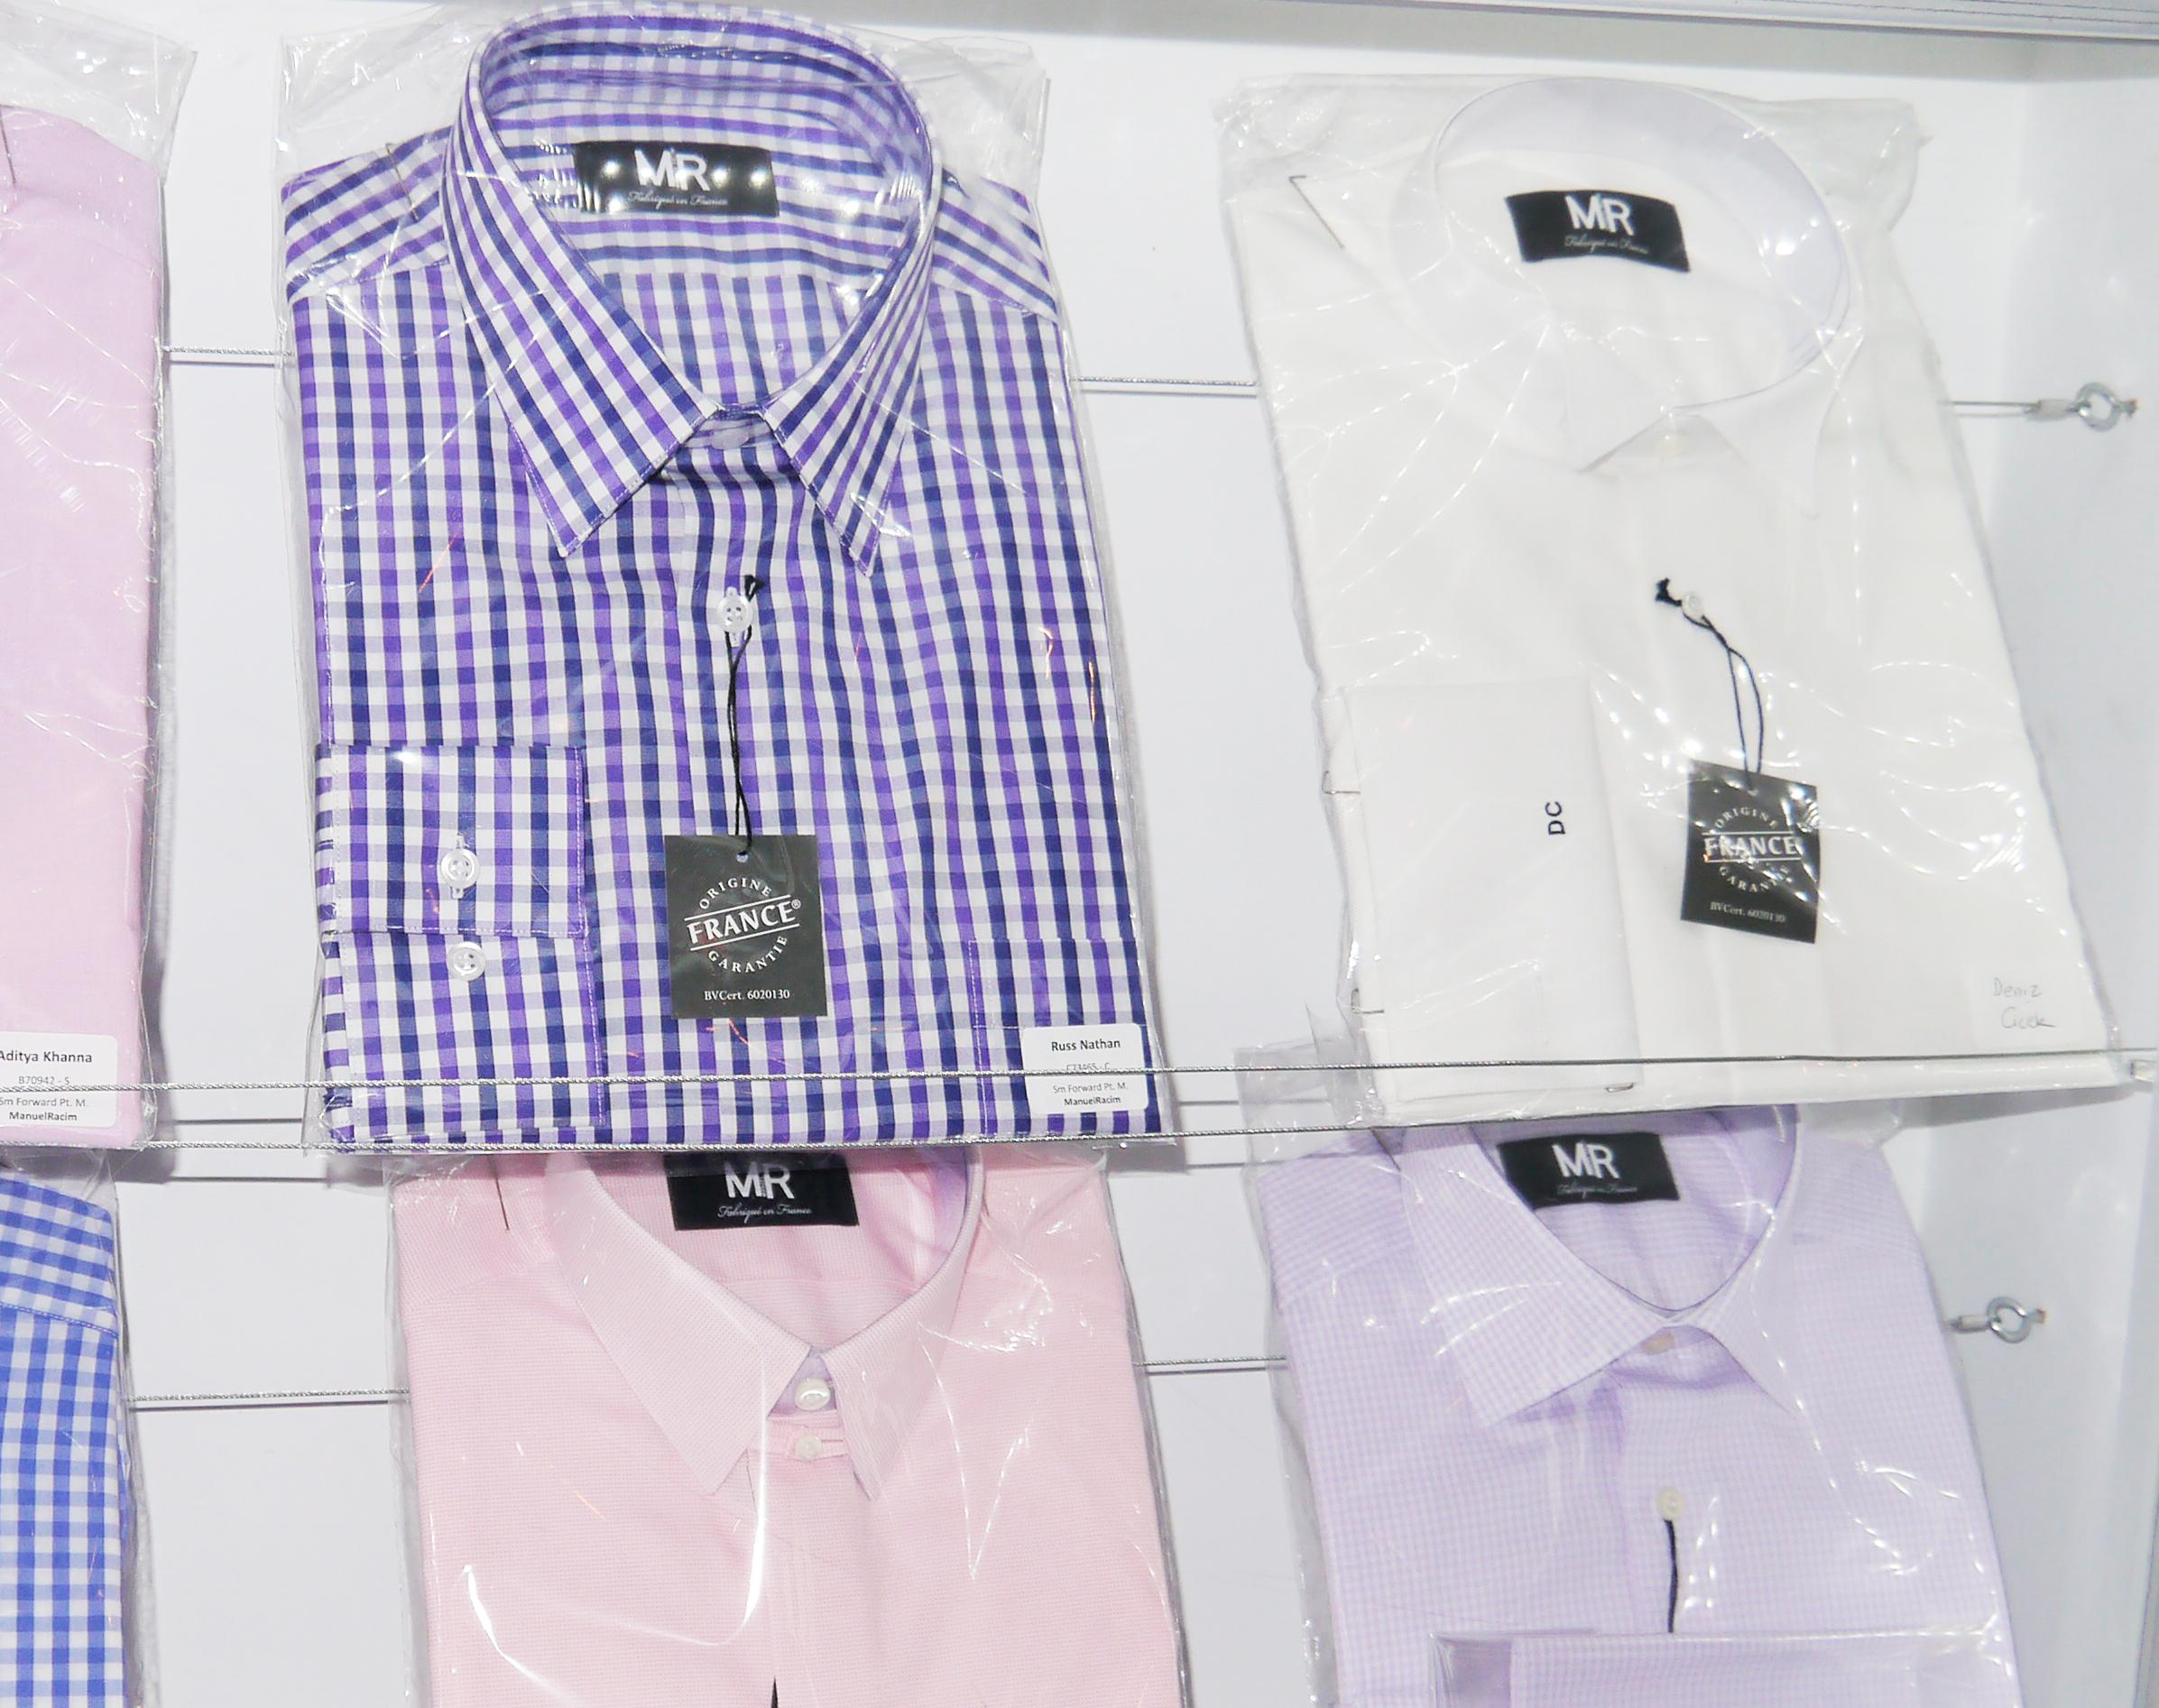 MR shirts on shelf 1